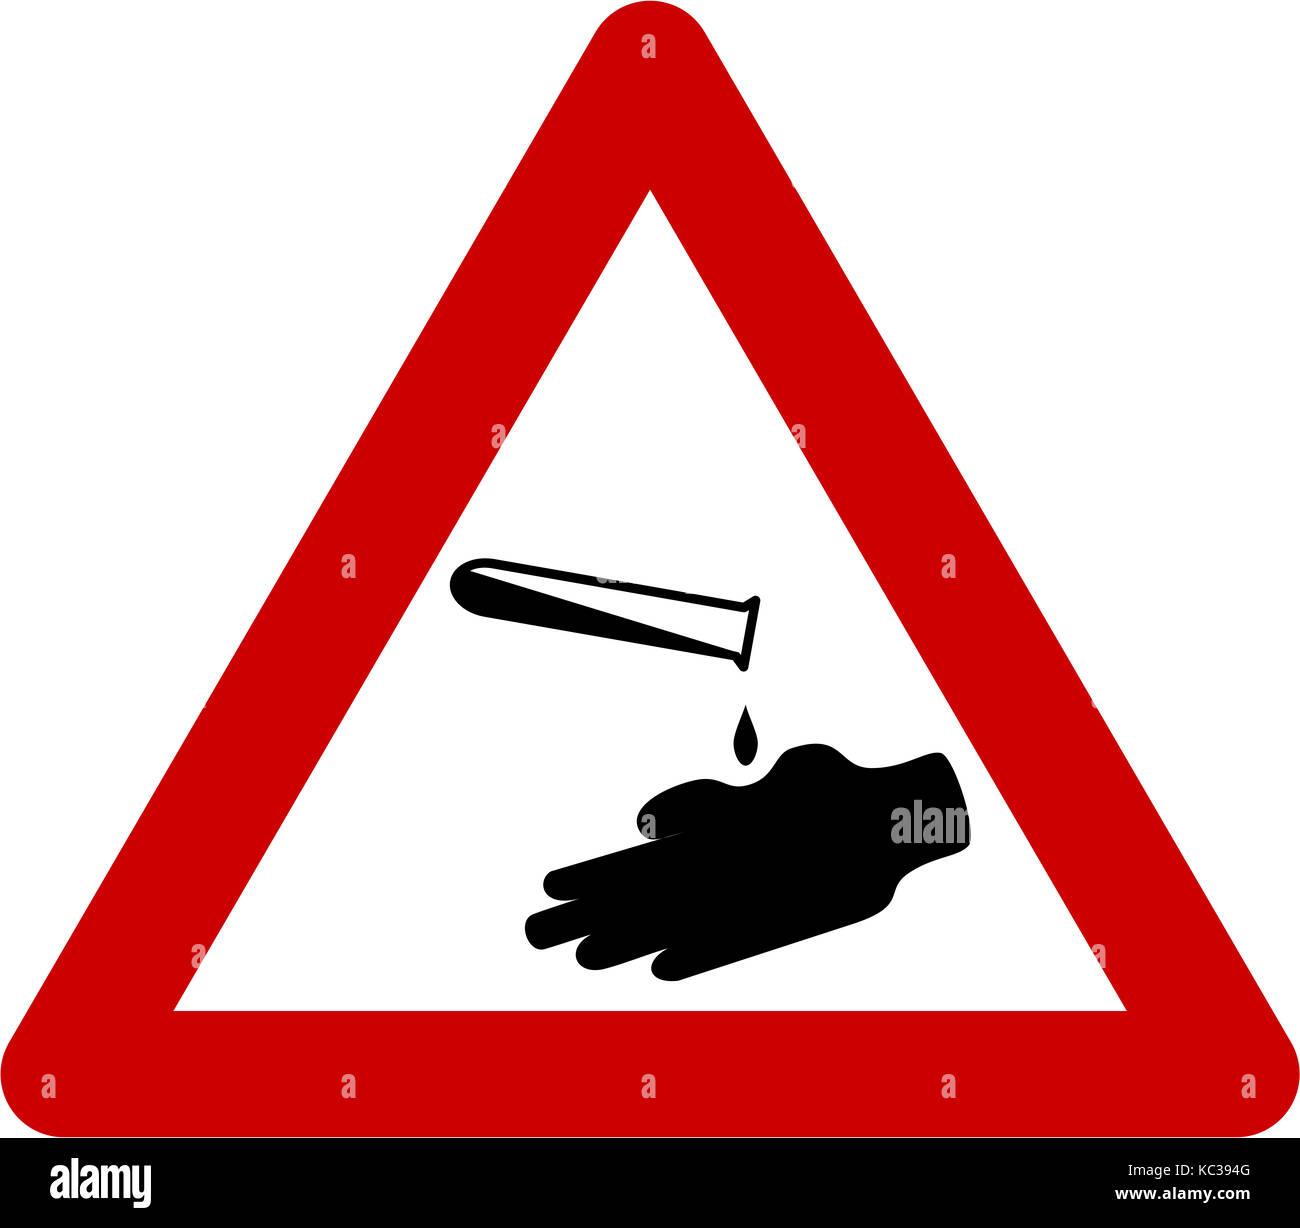 Corrosive safety symbol stock photos corrosive safety symbol warning sign with corrosive substances symbol stock image biocorpaavc Gallery